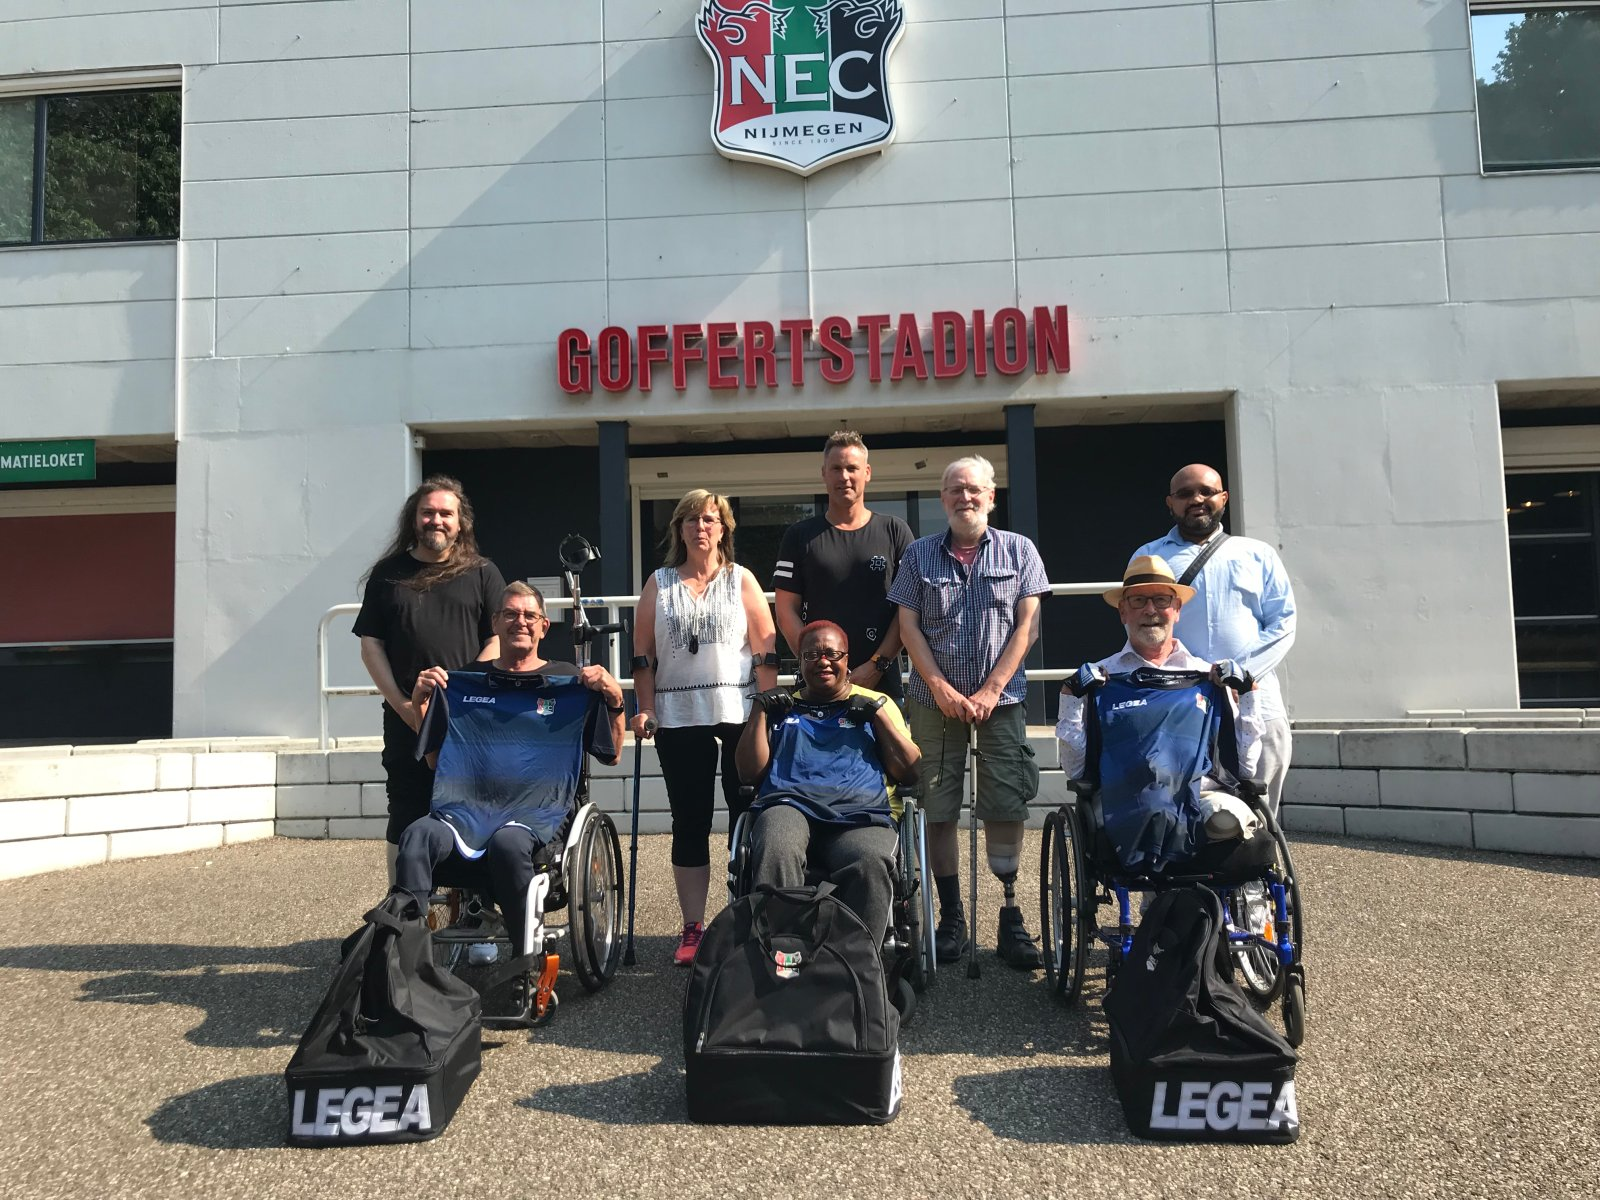 N.E.C. Parateam zoekt nieuwe deelnemers